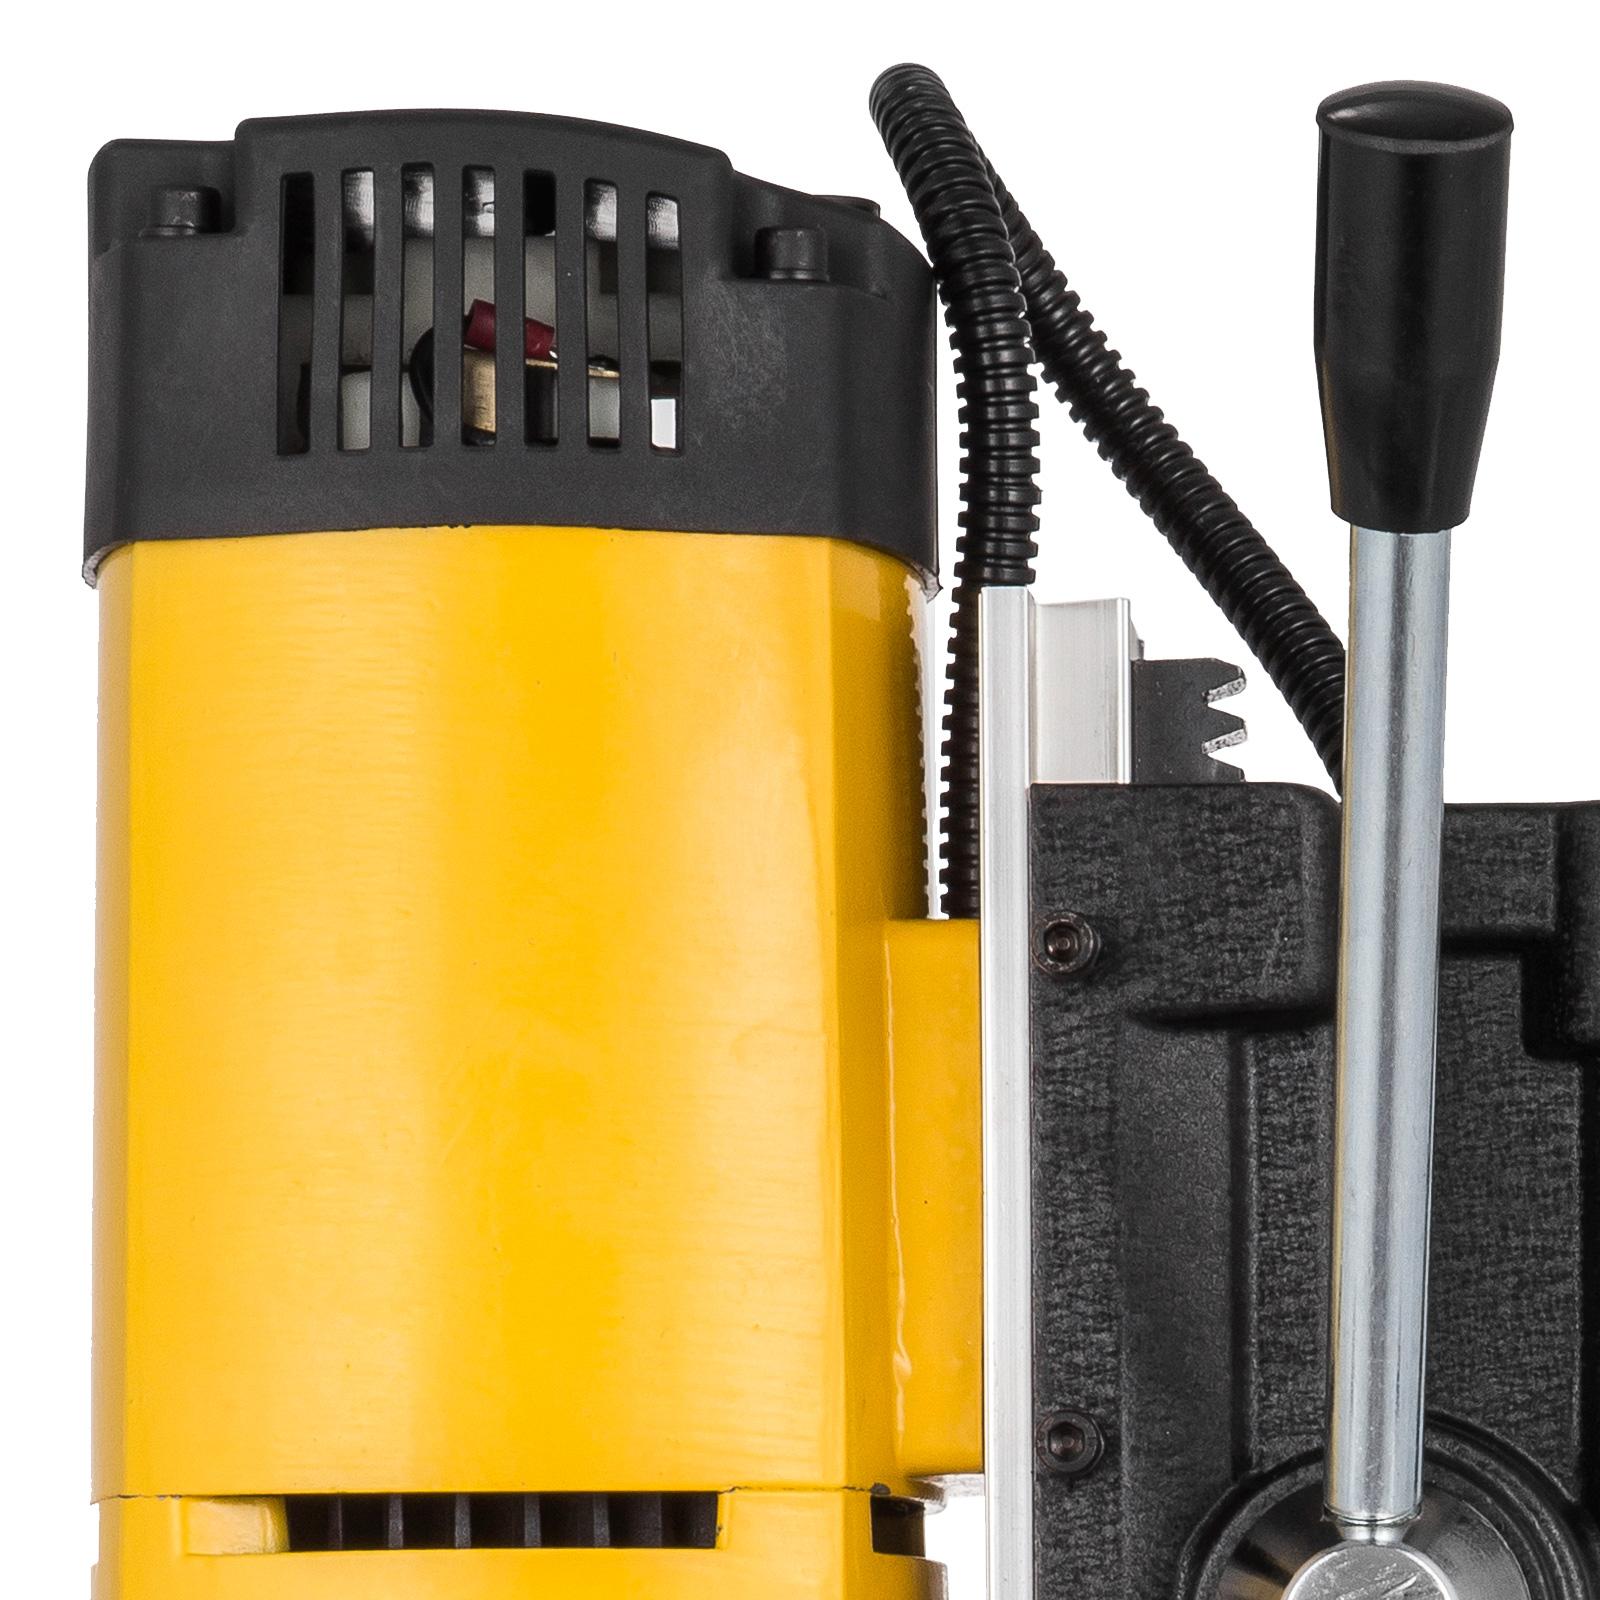 MB23-BRM35-MD40-Trapano-Perforatrice-Carotatore-Fresa-Magnetico-12-40mm-230V miniatura 56